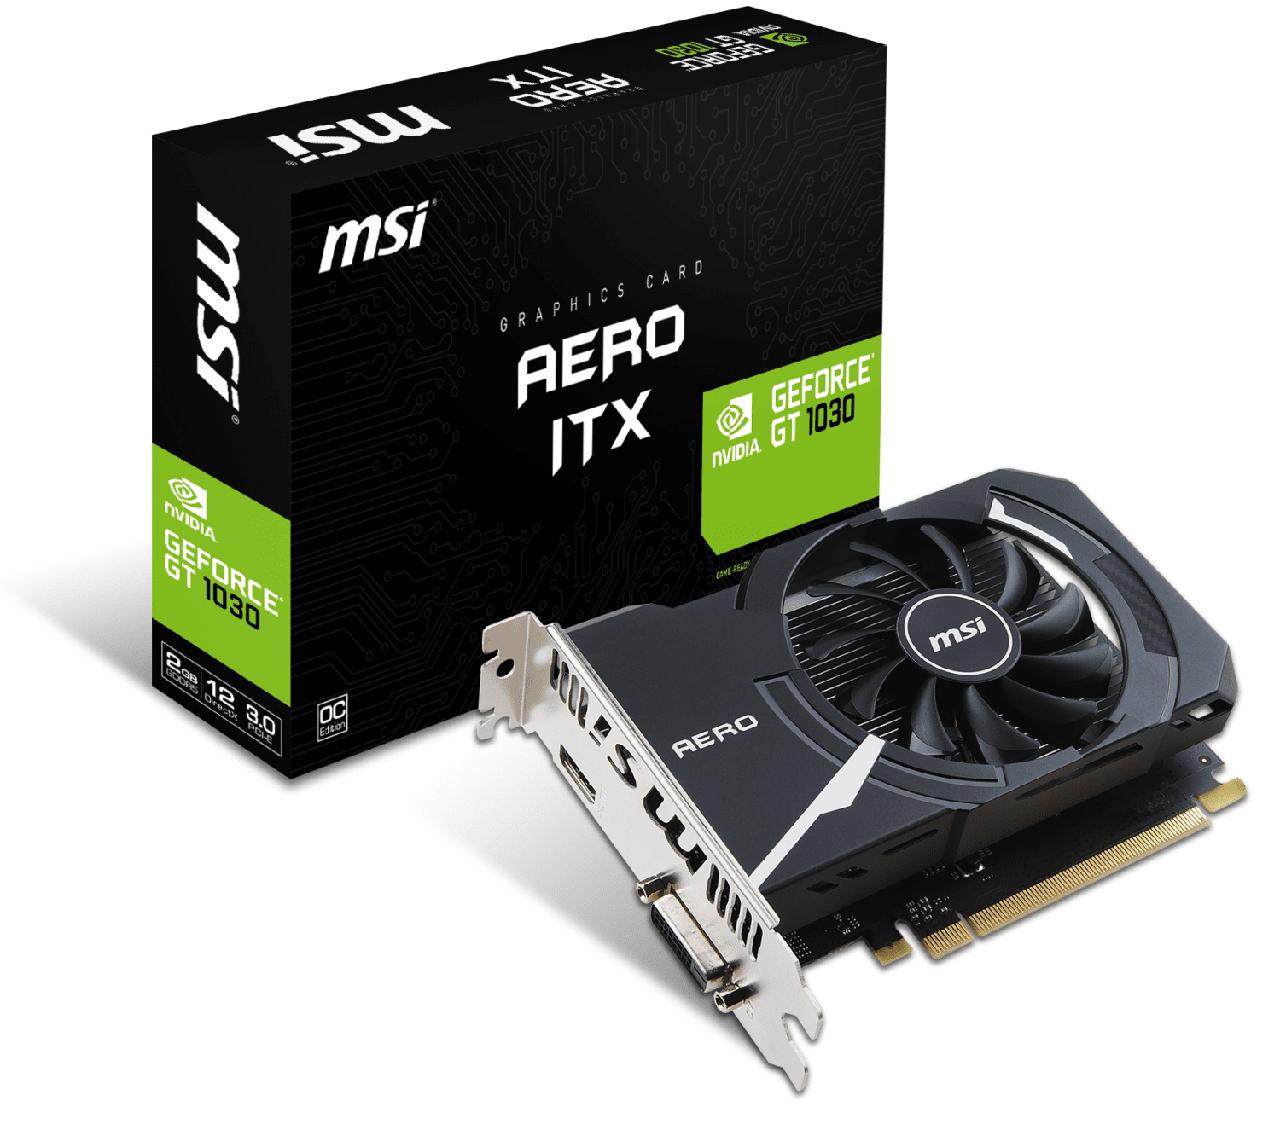 "Видеокарта MSI GT 1030 Aero ITX OC 2GB GDDR5 (64bit) ""Over-Stock"""